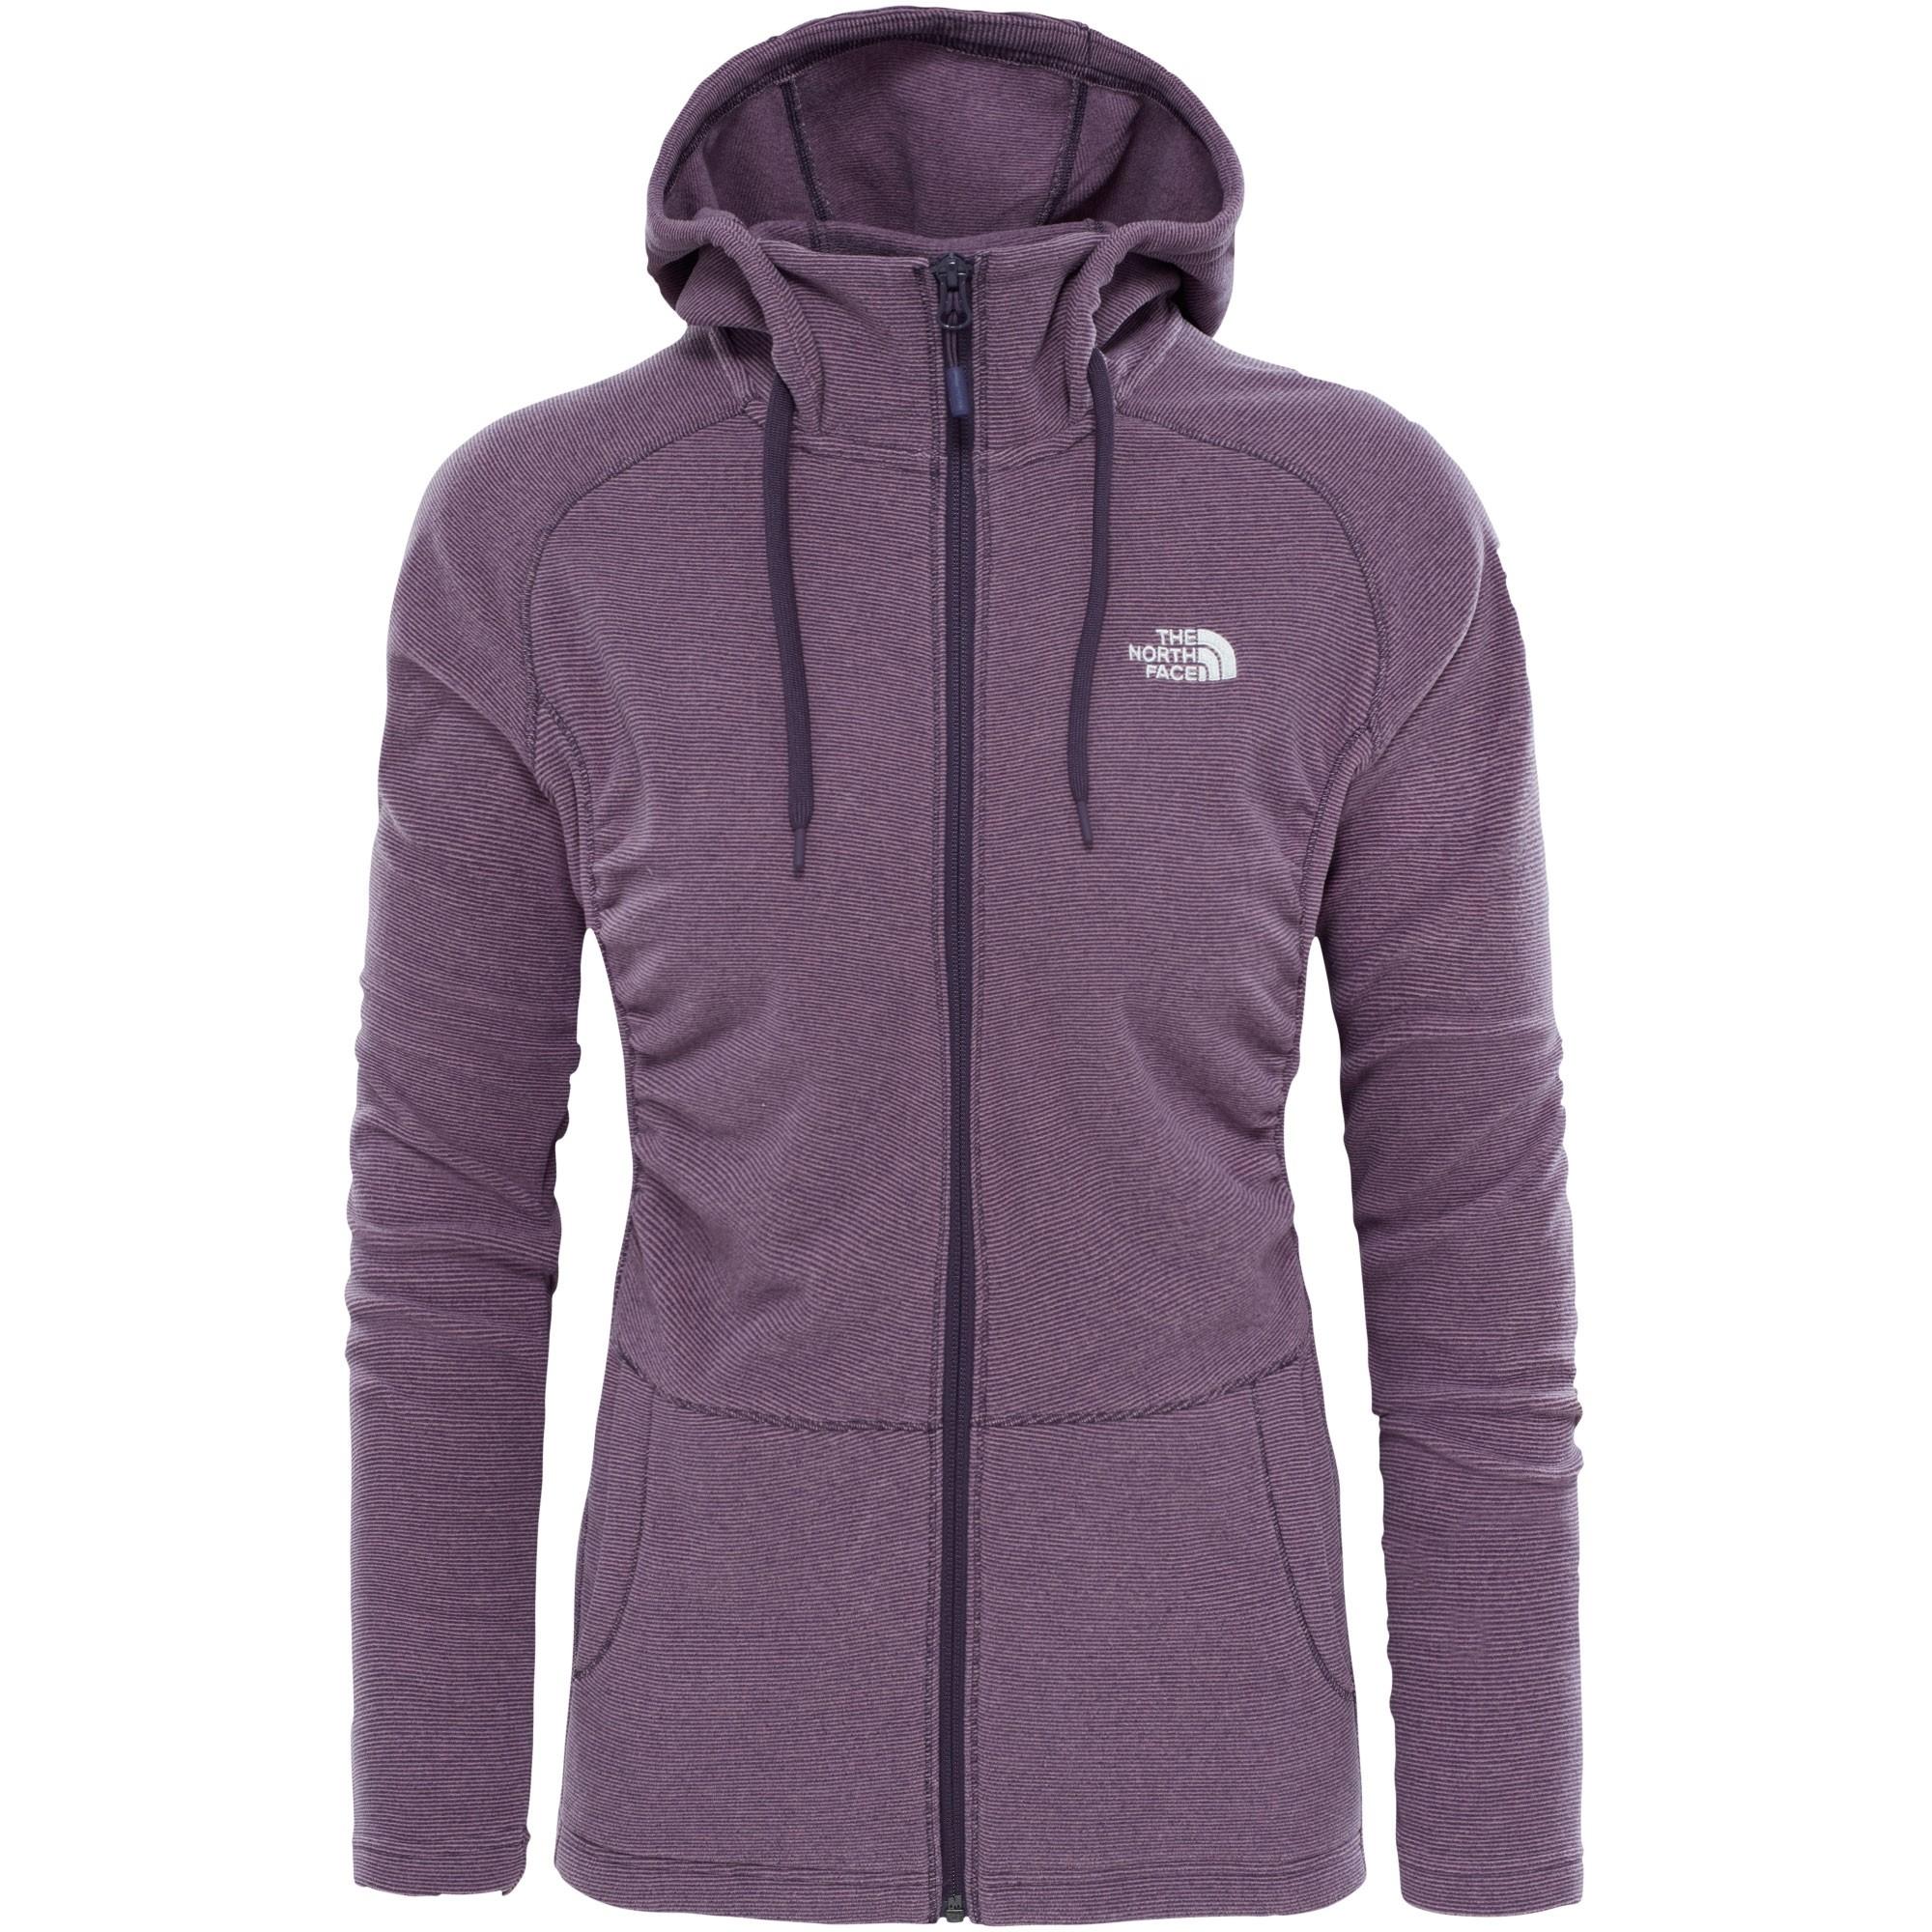 The-North-Face-Womens-Mezzaluna-Full-Zip-Hoodie-Dark-Eggplant-Purple-Stripe-0-W17